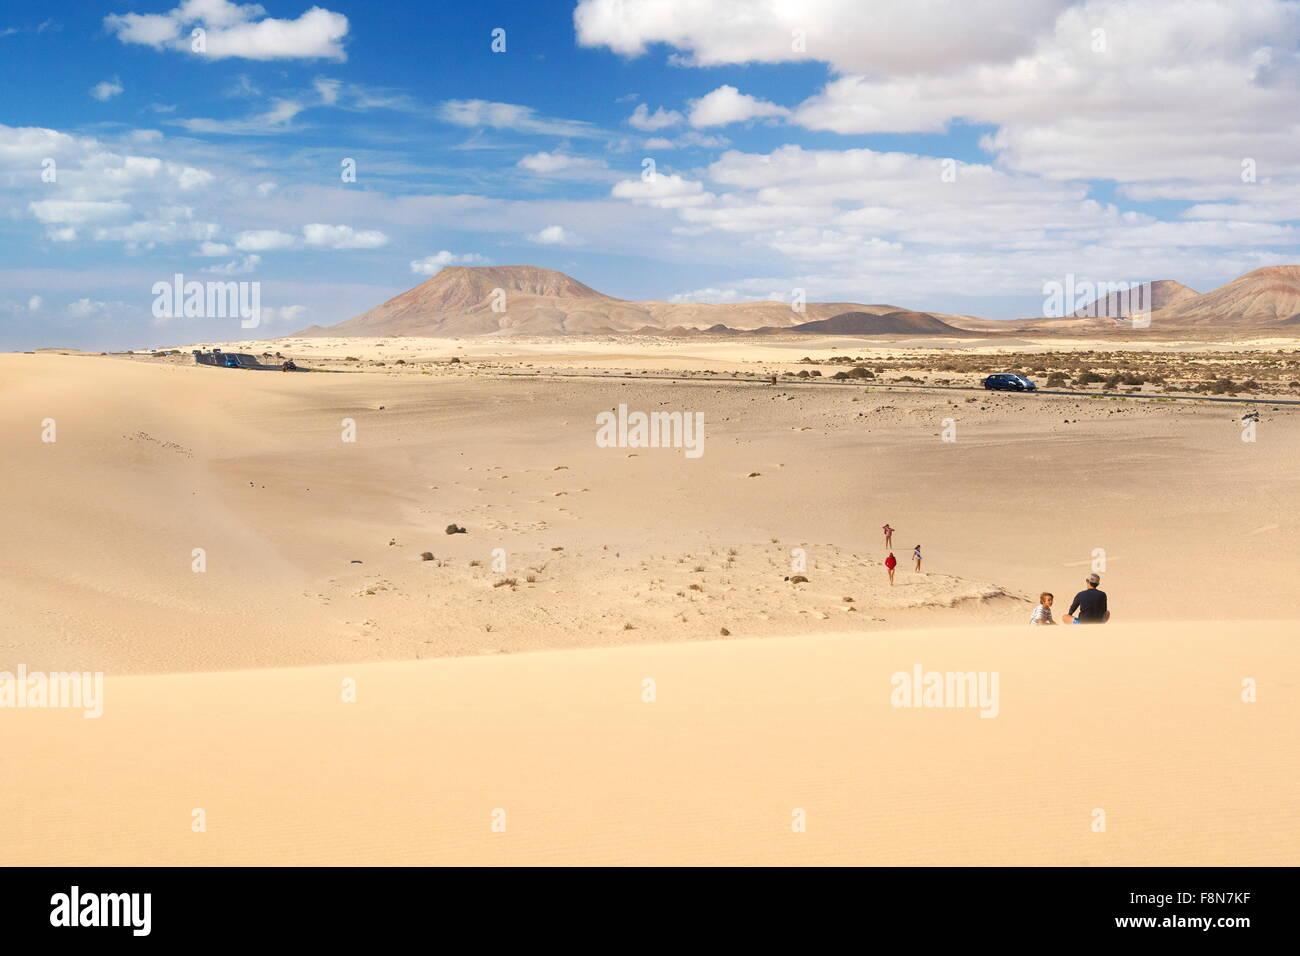 Sanddünen im Parque Natural de Corralejo, Kanaren Insel Fuerteventura, Spanien Stockbild